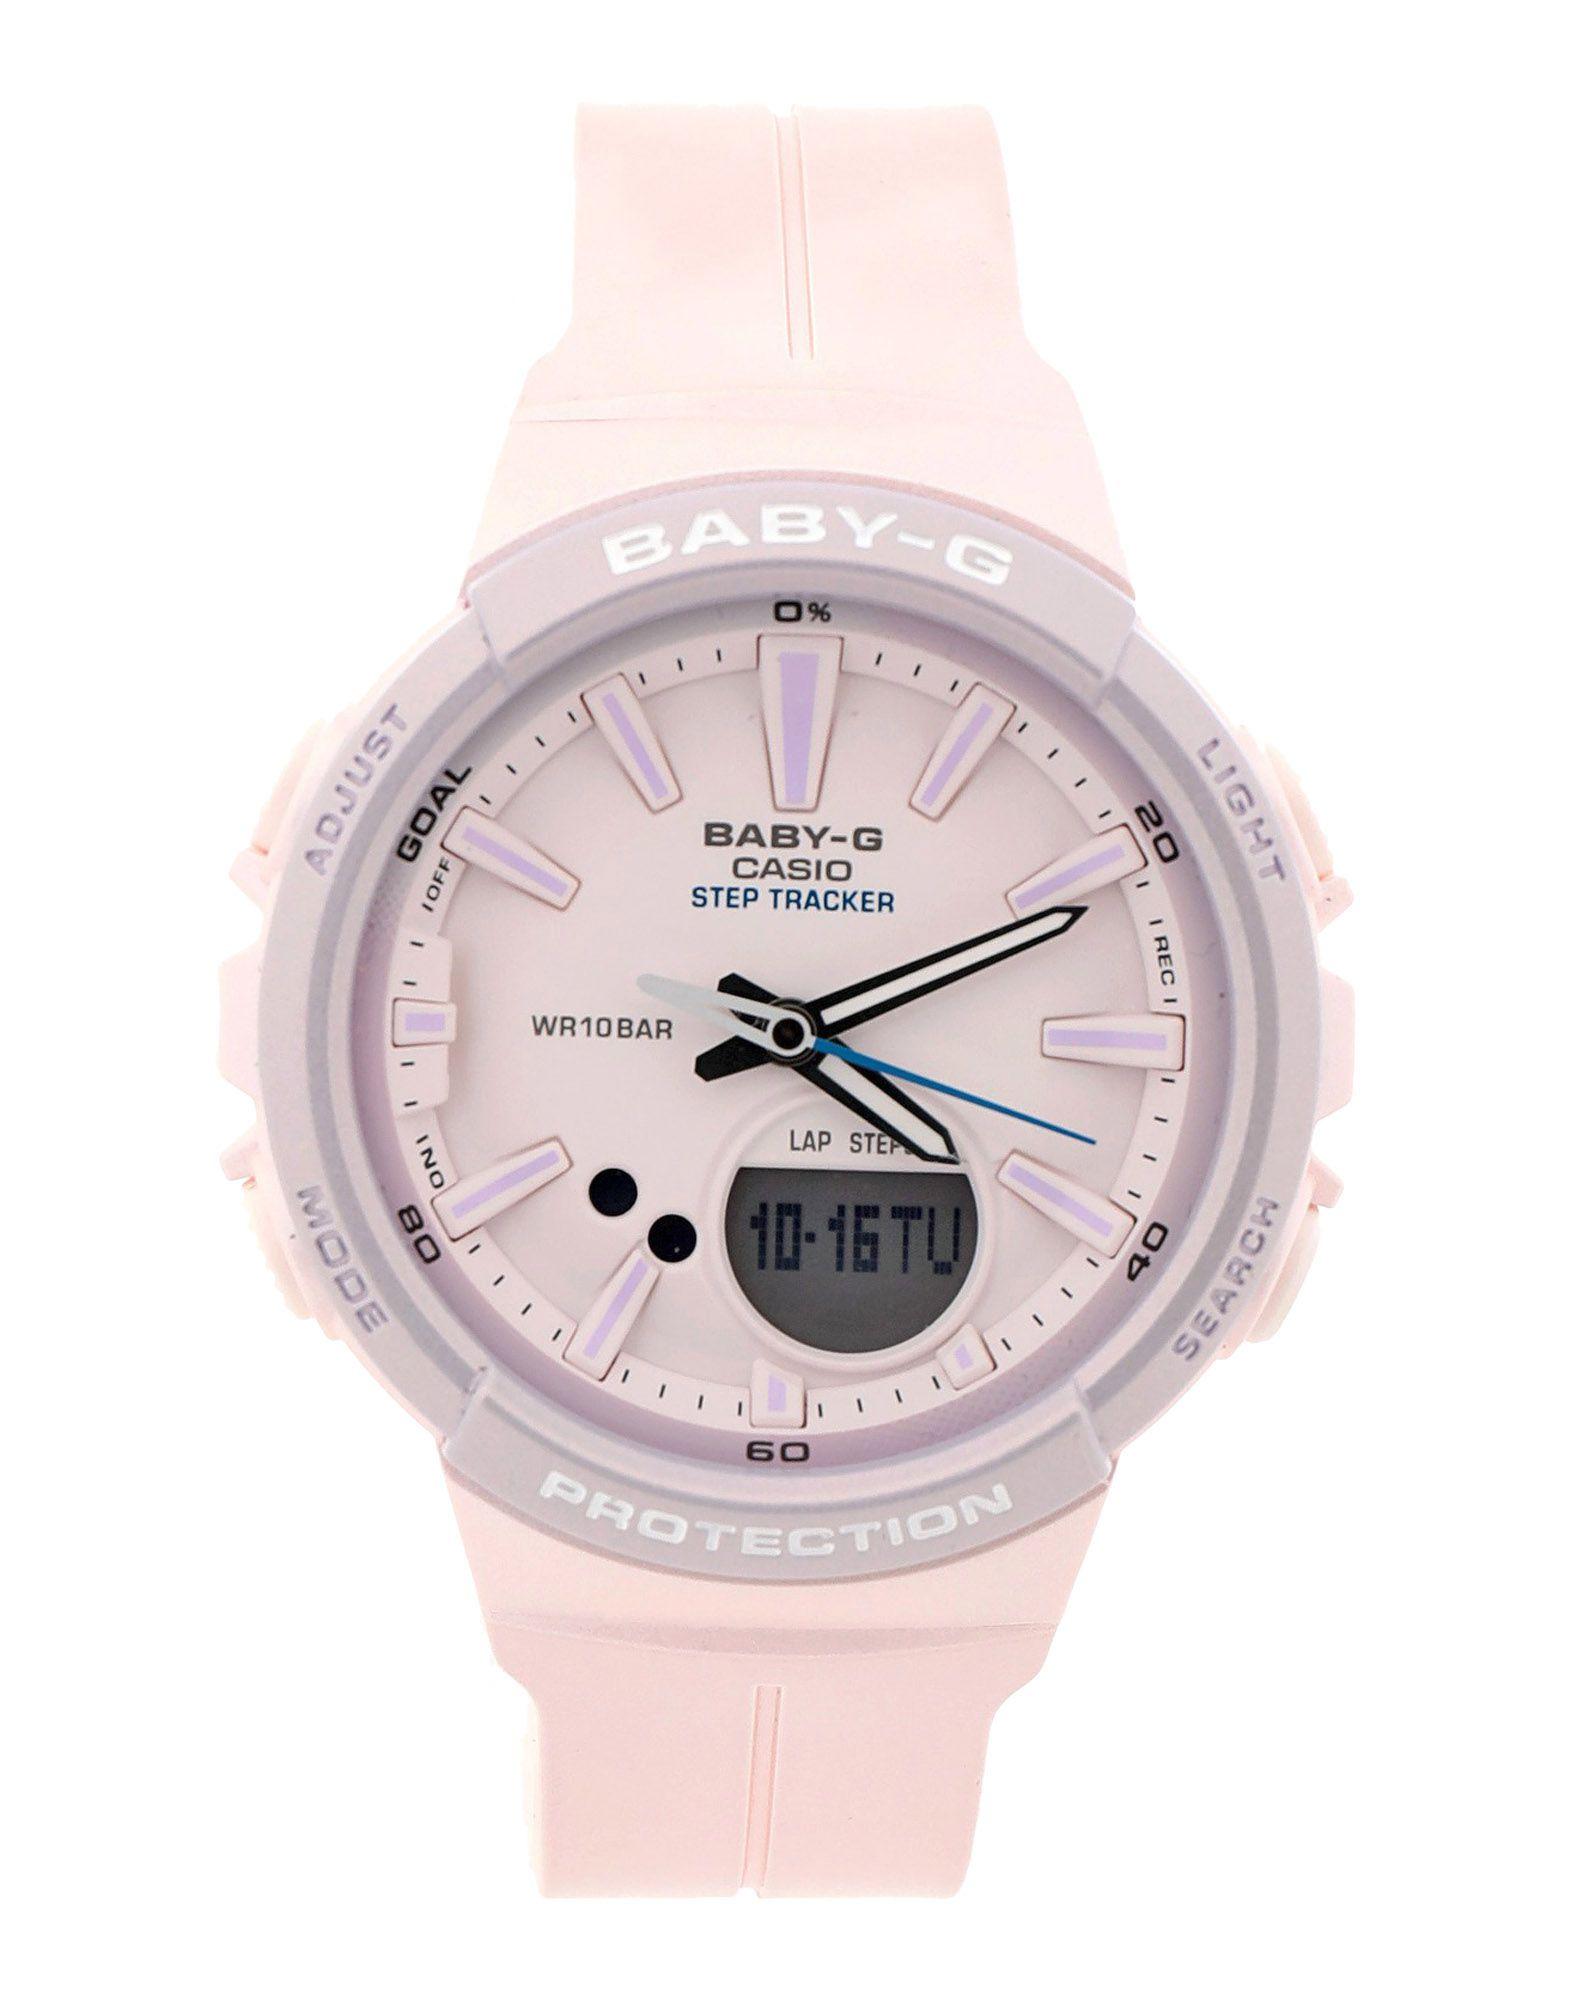 CASIO BABY-G Наручные часы наручные часы casio bga 190kt 7b